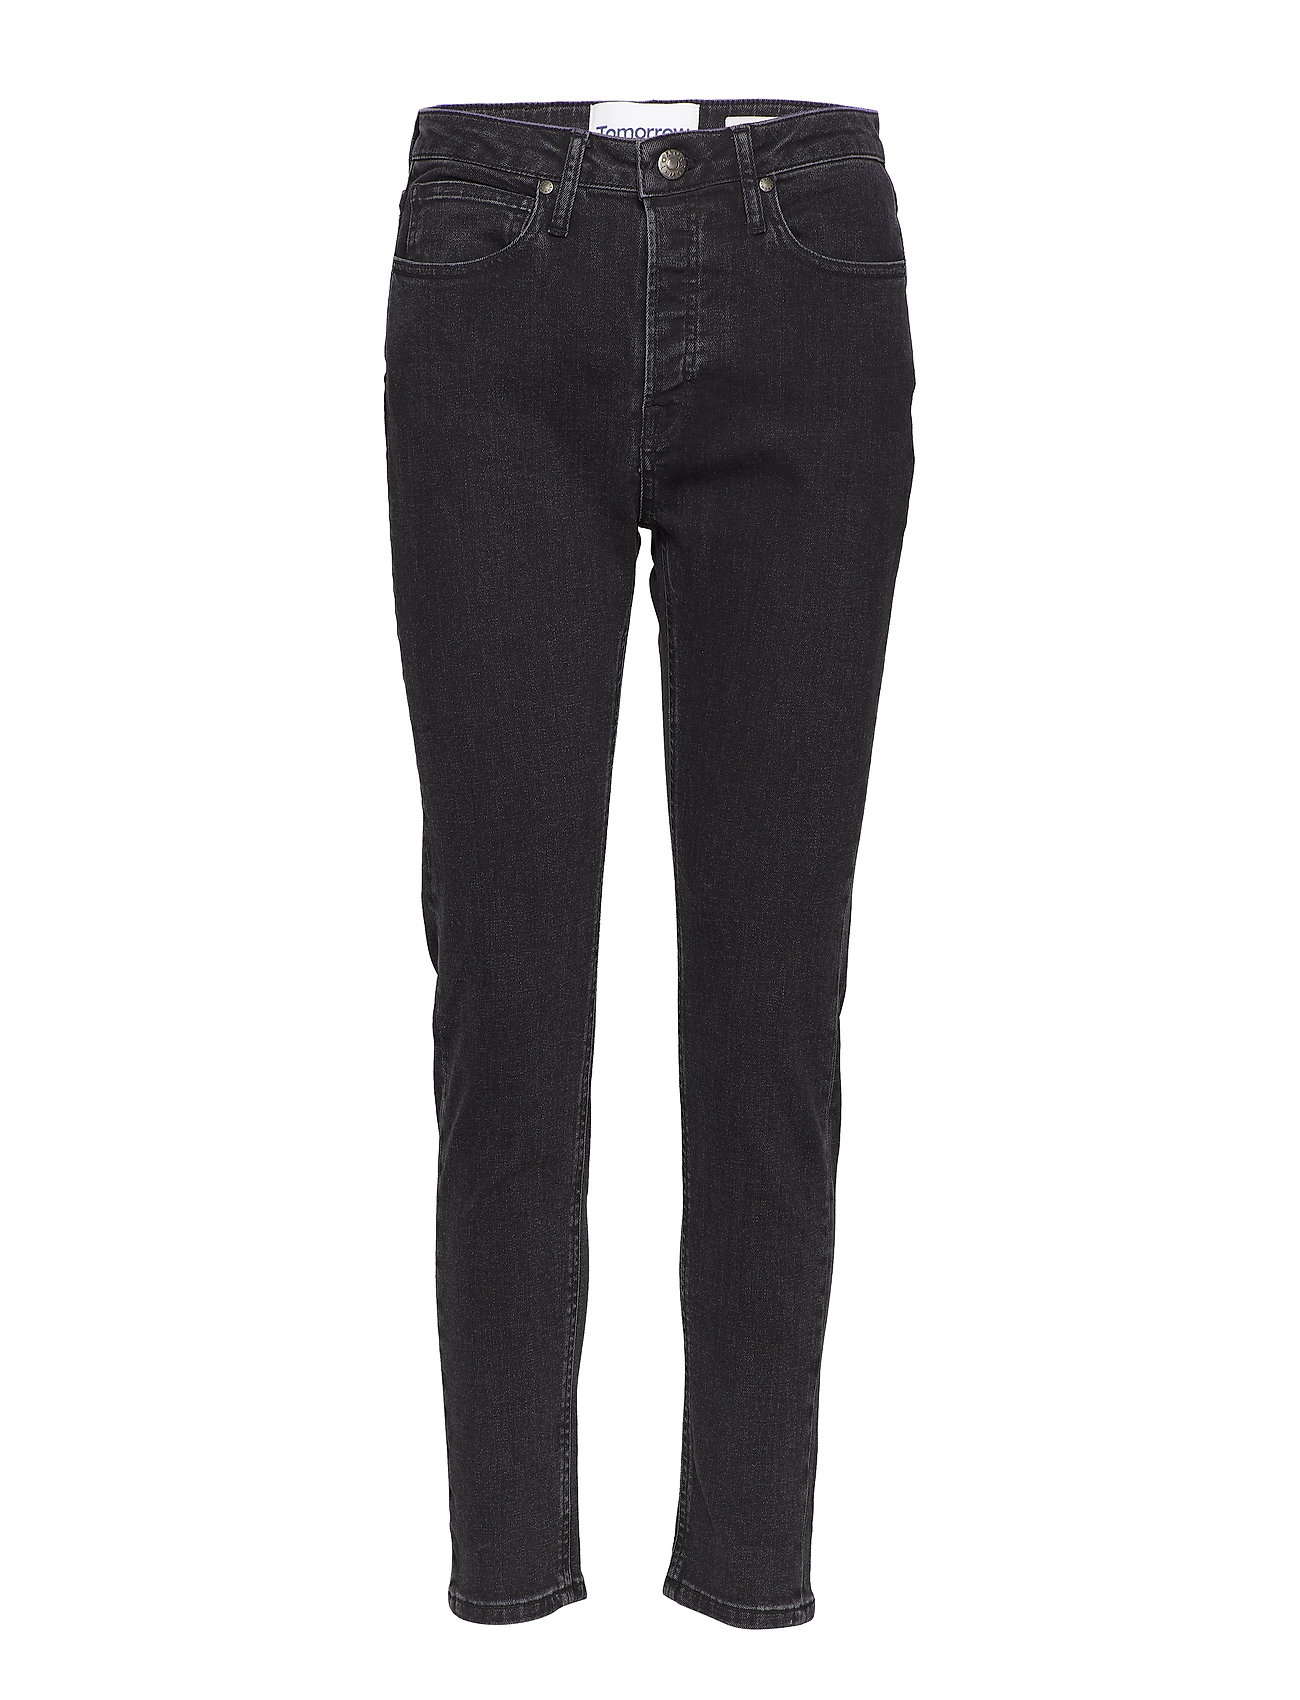 Image of Hepburn Hw Mom Original Black Jeans Mom Jeans Sort Tomorrow (3350047881)